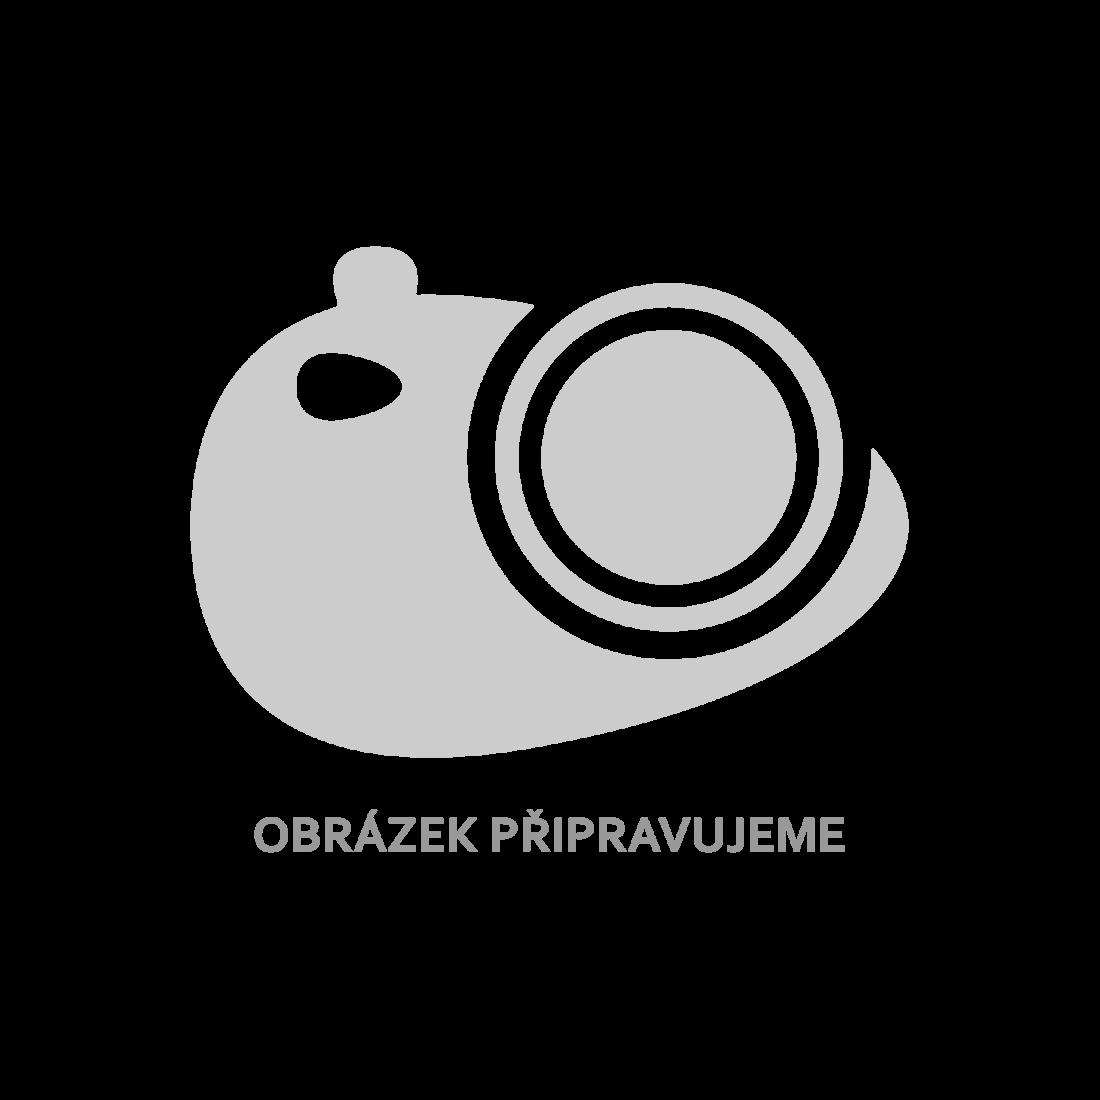 Roleta Zebra / noc a den / Twinroll 100 x 175 cm, bílá